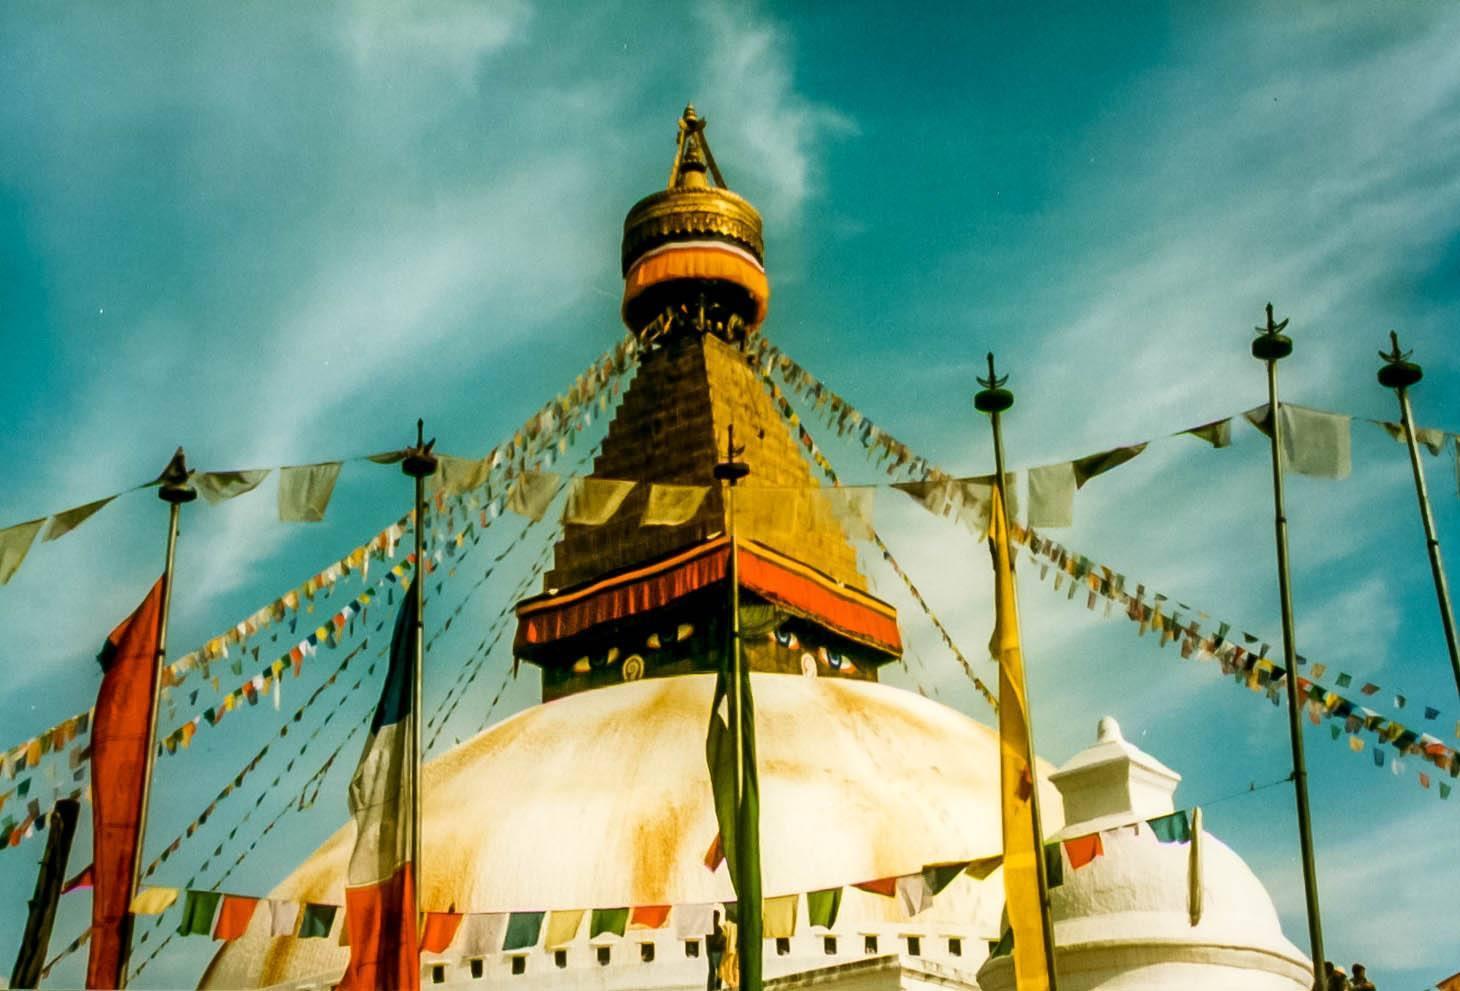 The Boudhanath Stupa with flags in Kathmandu, Nepal